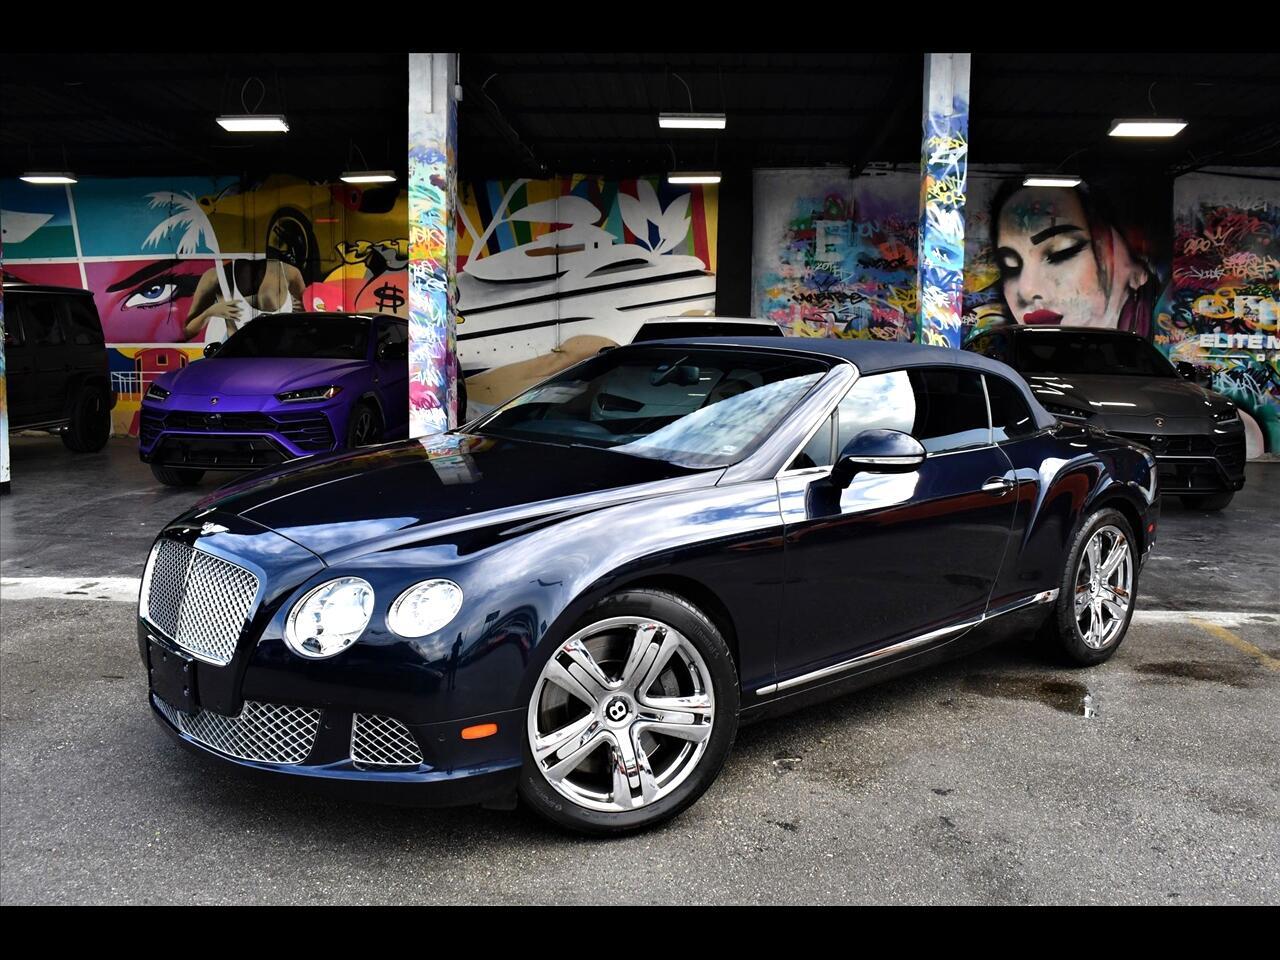 2012 Bentley Continental GTC Convertible 2D GTC AWD 6.0L W12 Turbo